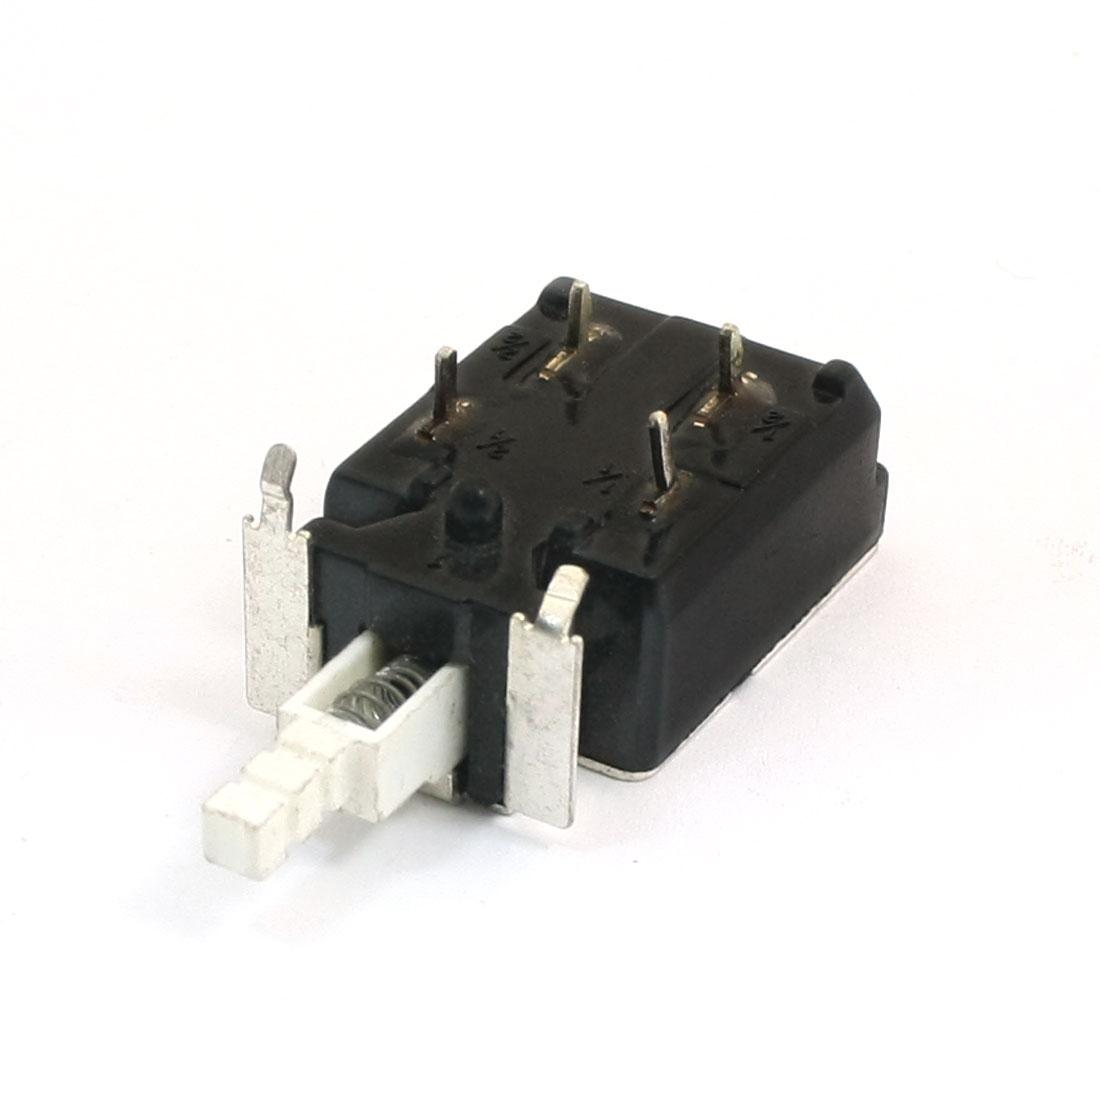 KDC-A20 4 Terminals AC 250V 128A/4A DPST Self-Locking Push Button Power Switch